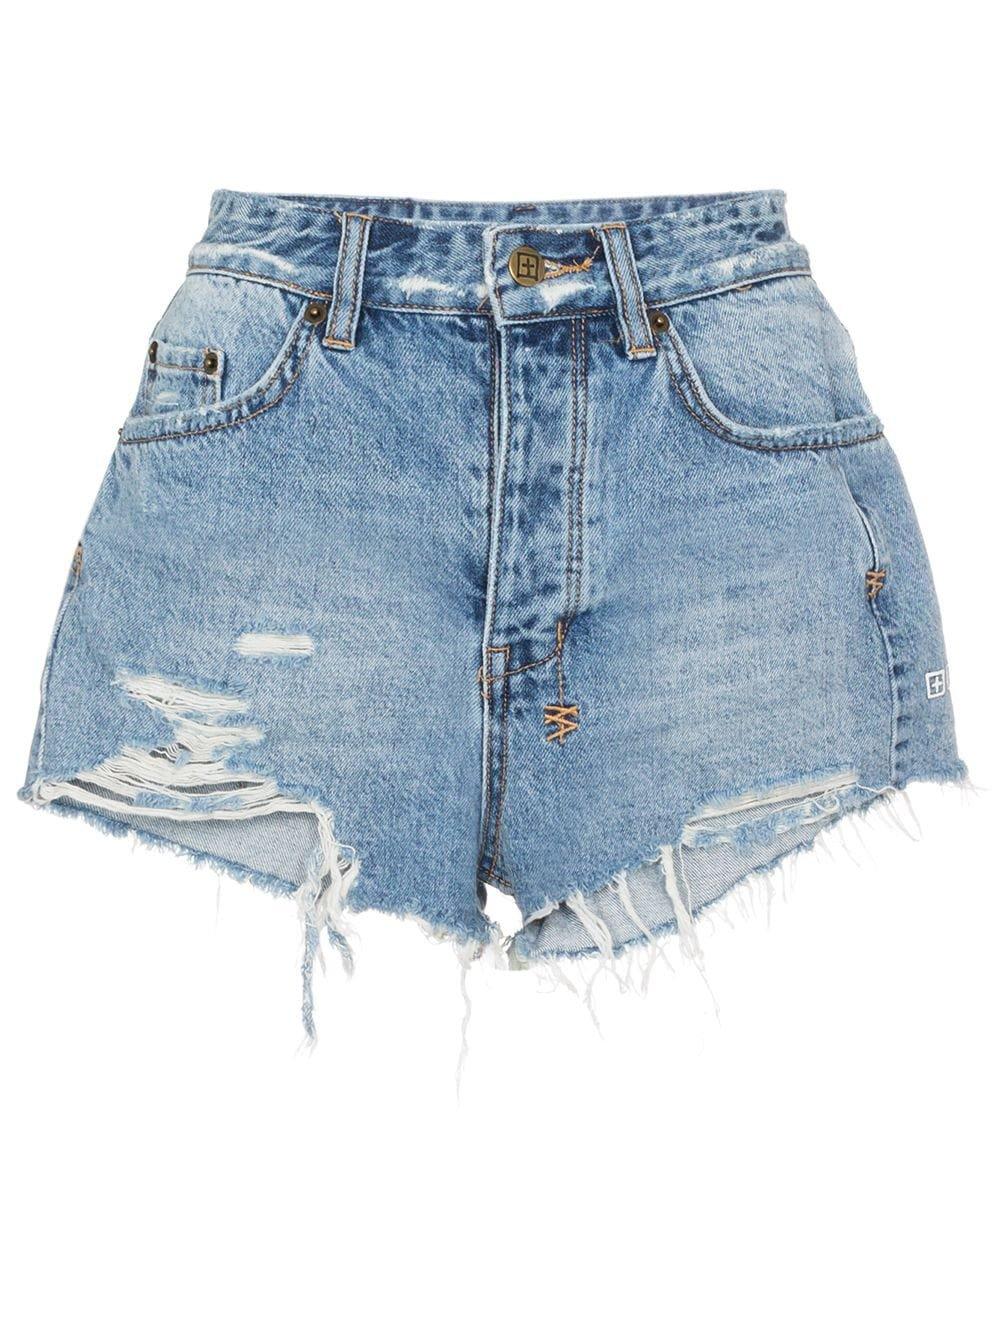 Ksubi Tongue N Cheek Denim Shorts - Farfetch